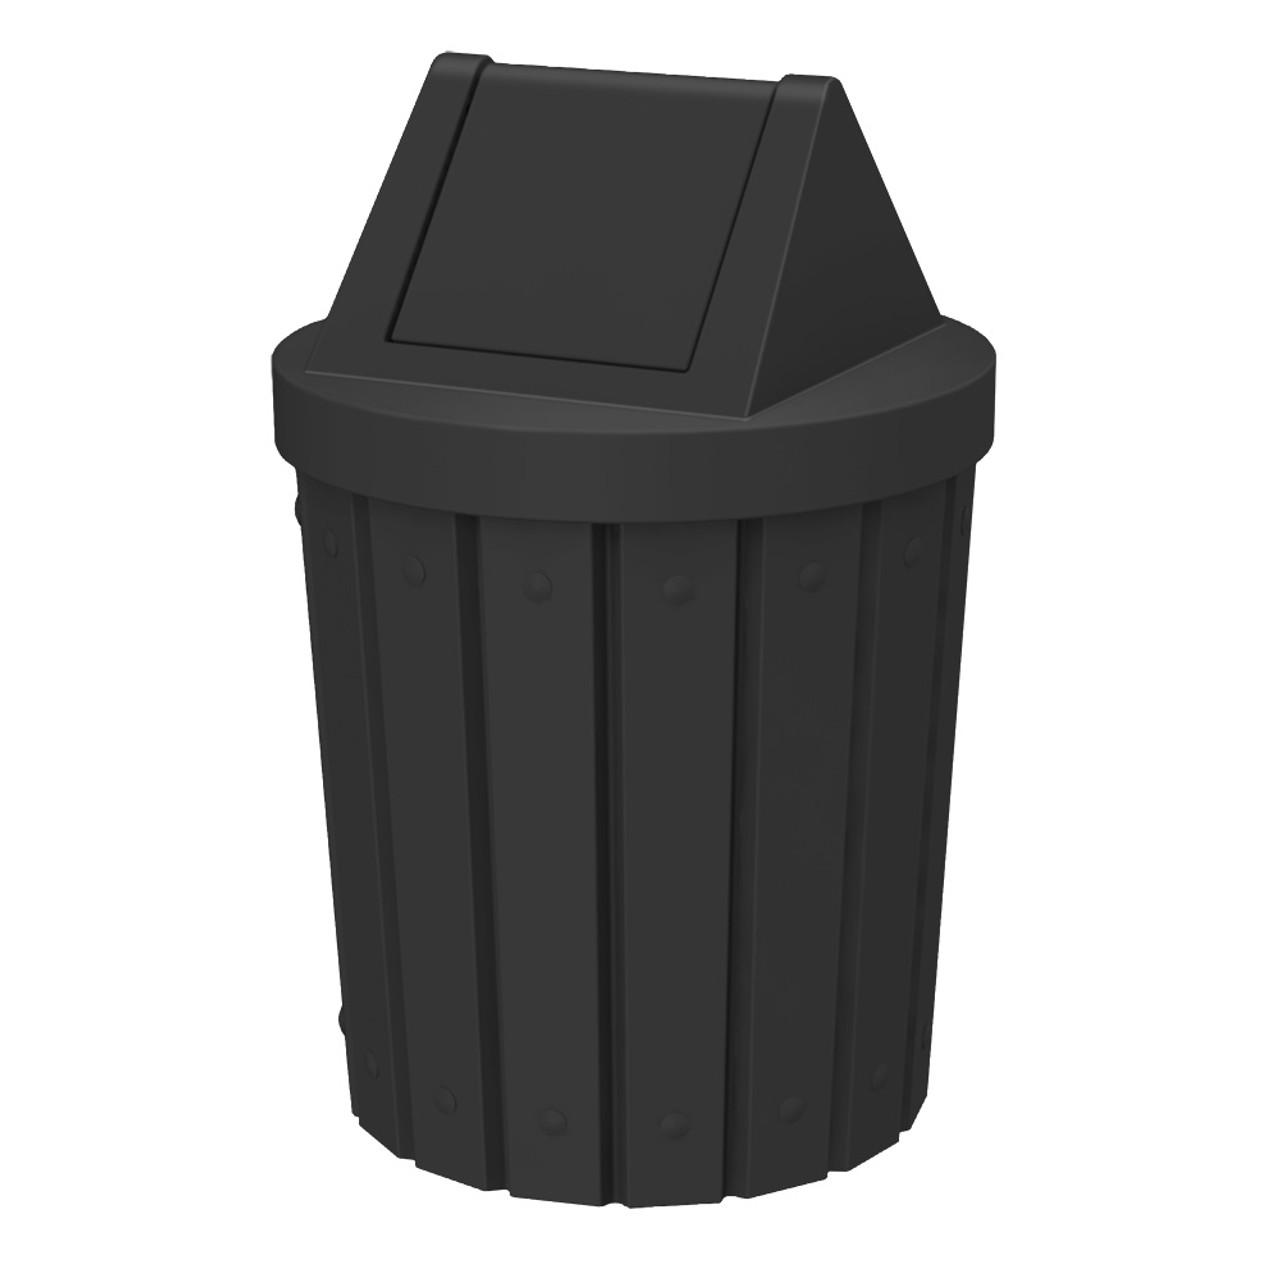 42 Gallon Kolor Can Heavy Duty Swing Top Park Trash Can S8284A-00 BLACK